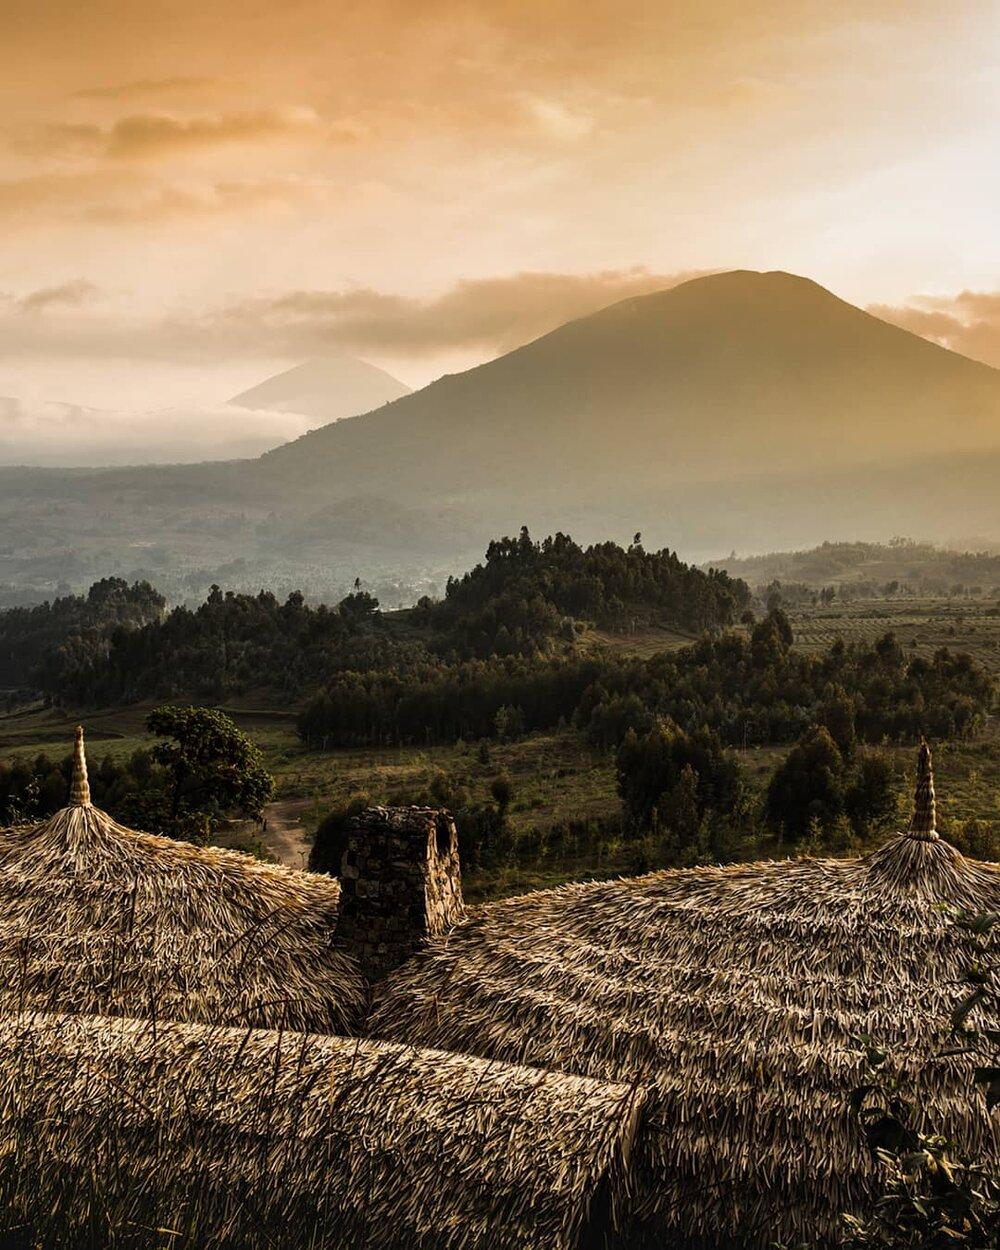 A sunset over the Virunga Mountains in Rwanda. Photo: @tom_parker_photographer